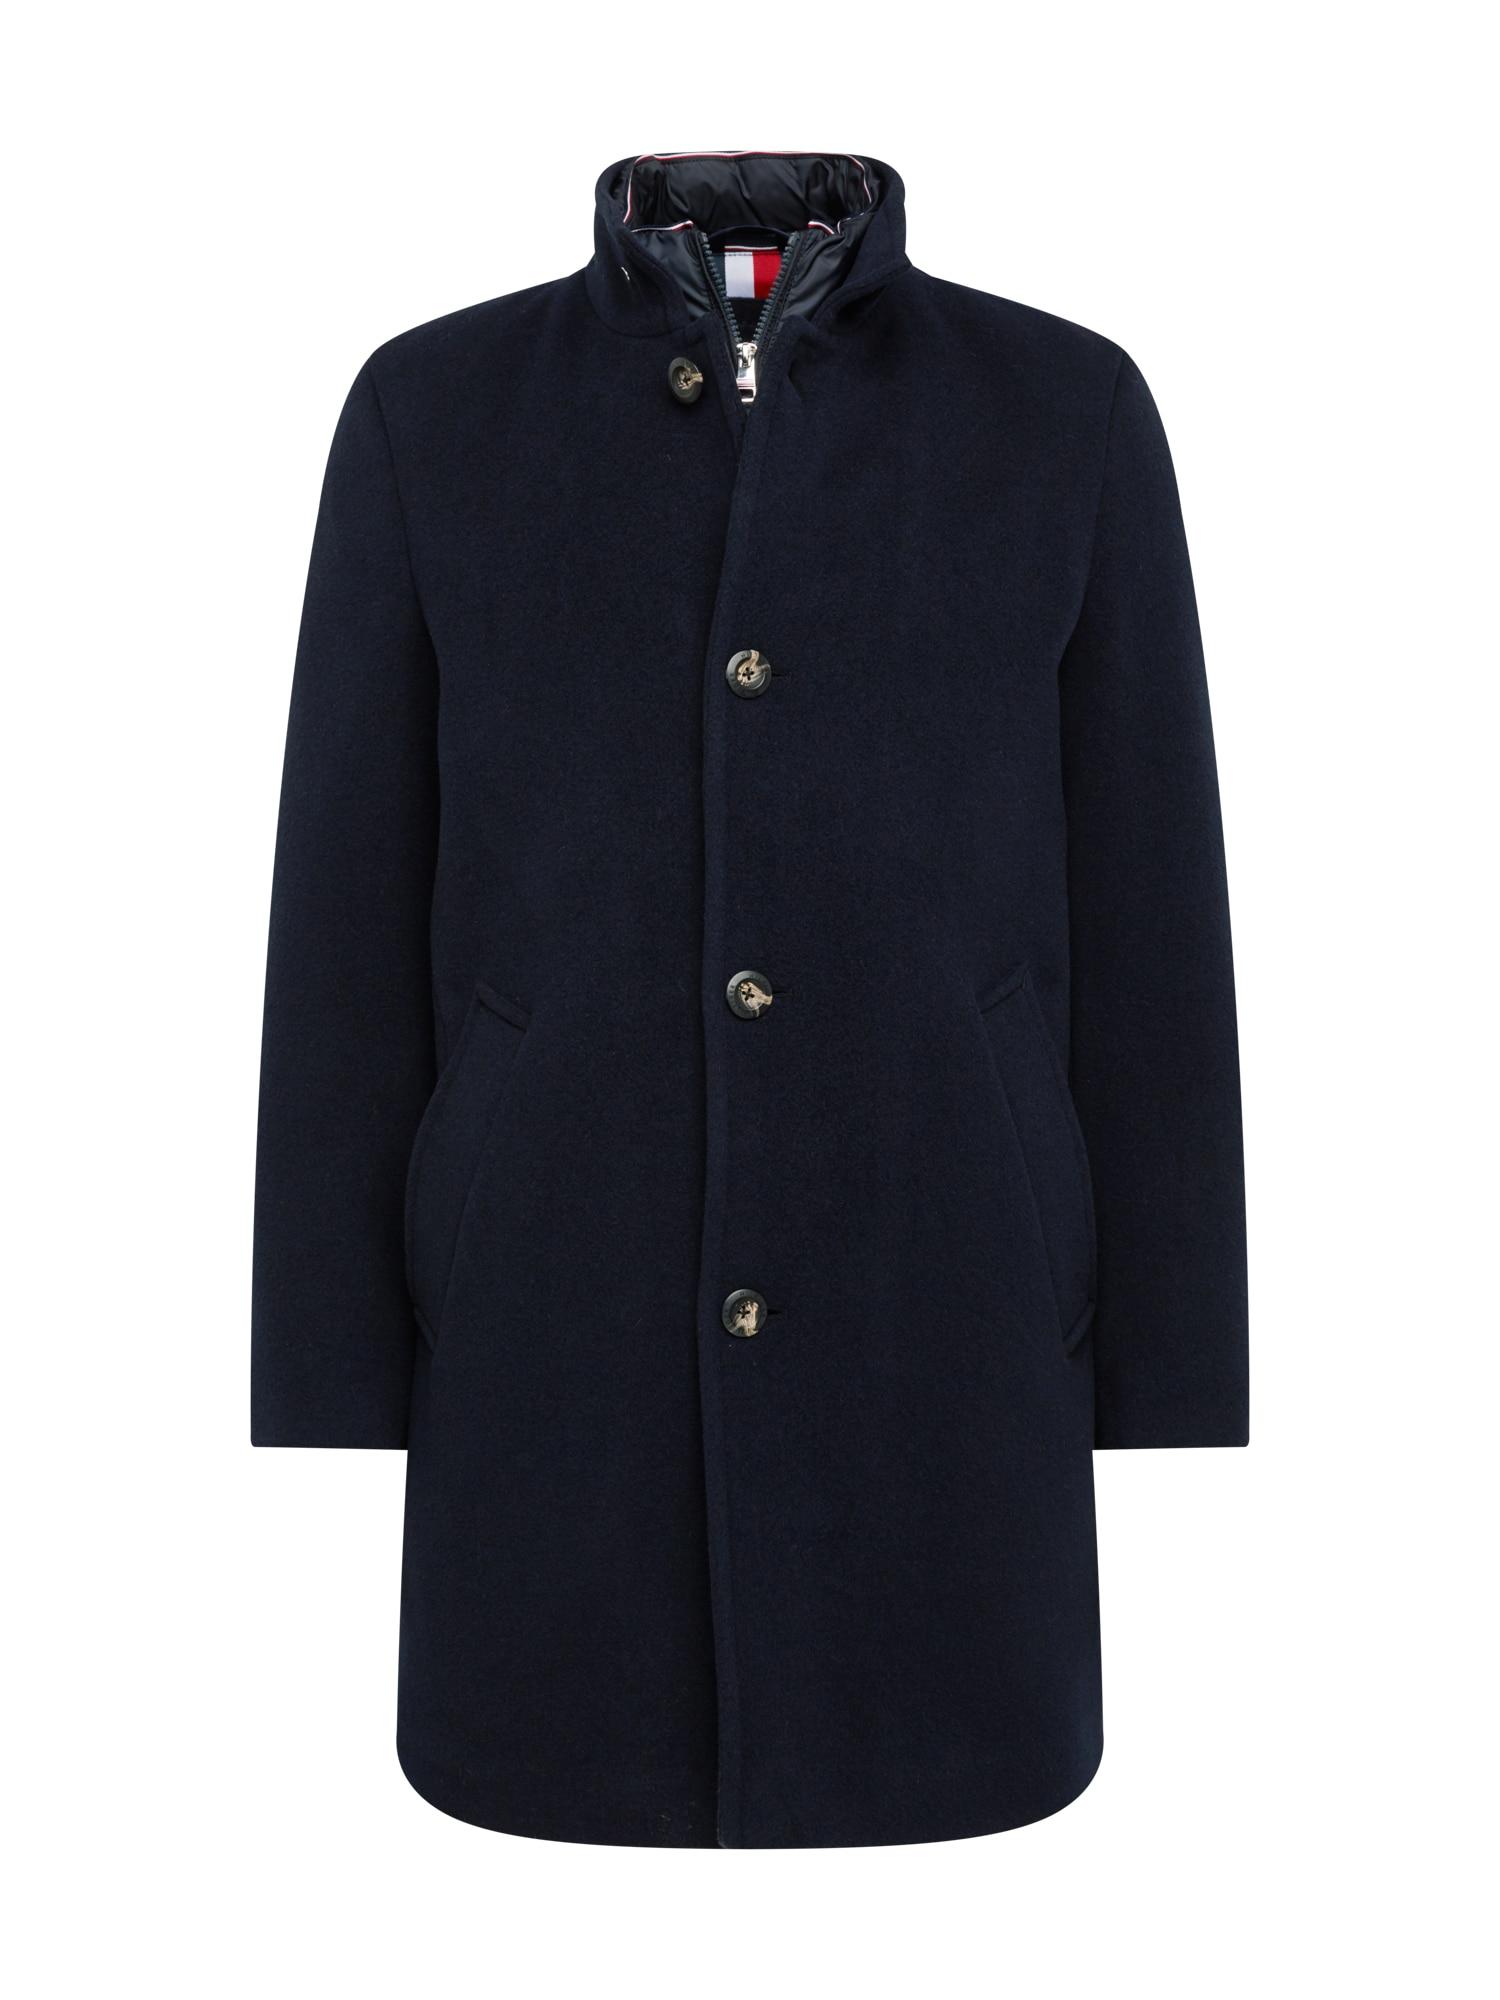 TOMMY HILFIGER Demisezoninis paltas nakties mėlyna